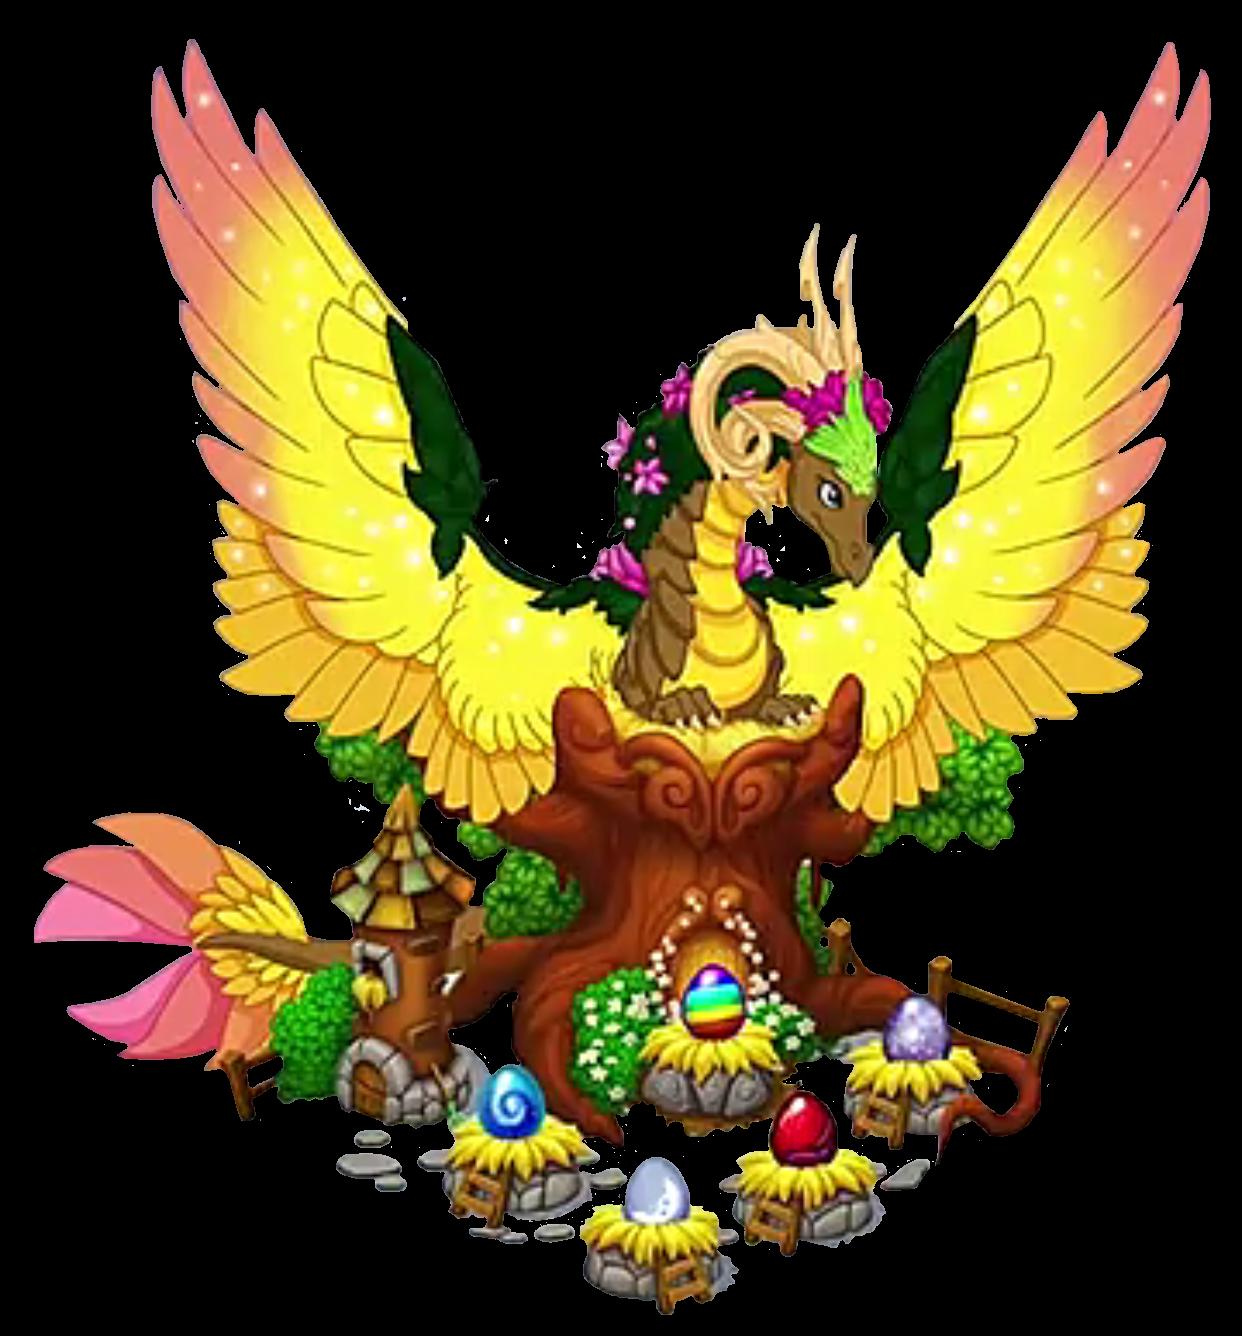 Mother clipart nurturing. Gaia dragonvale world wikia